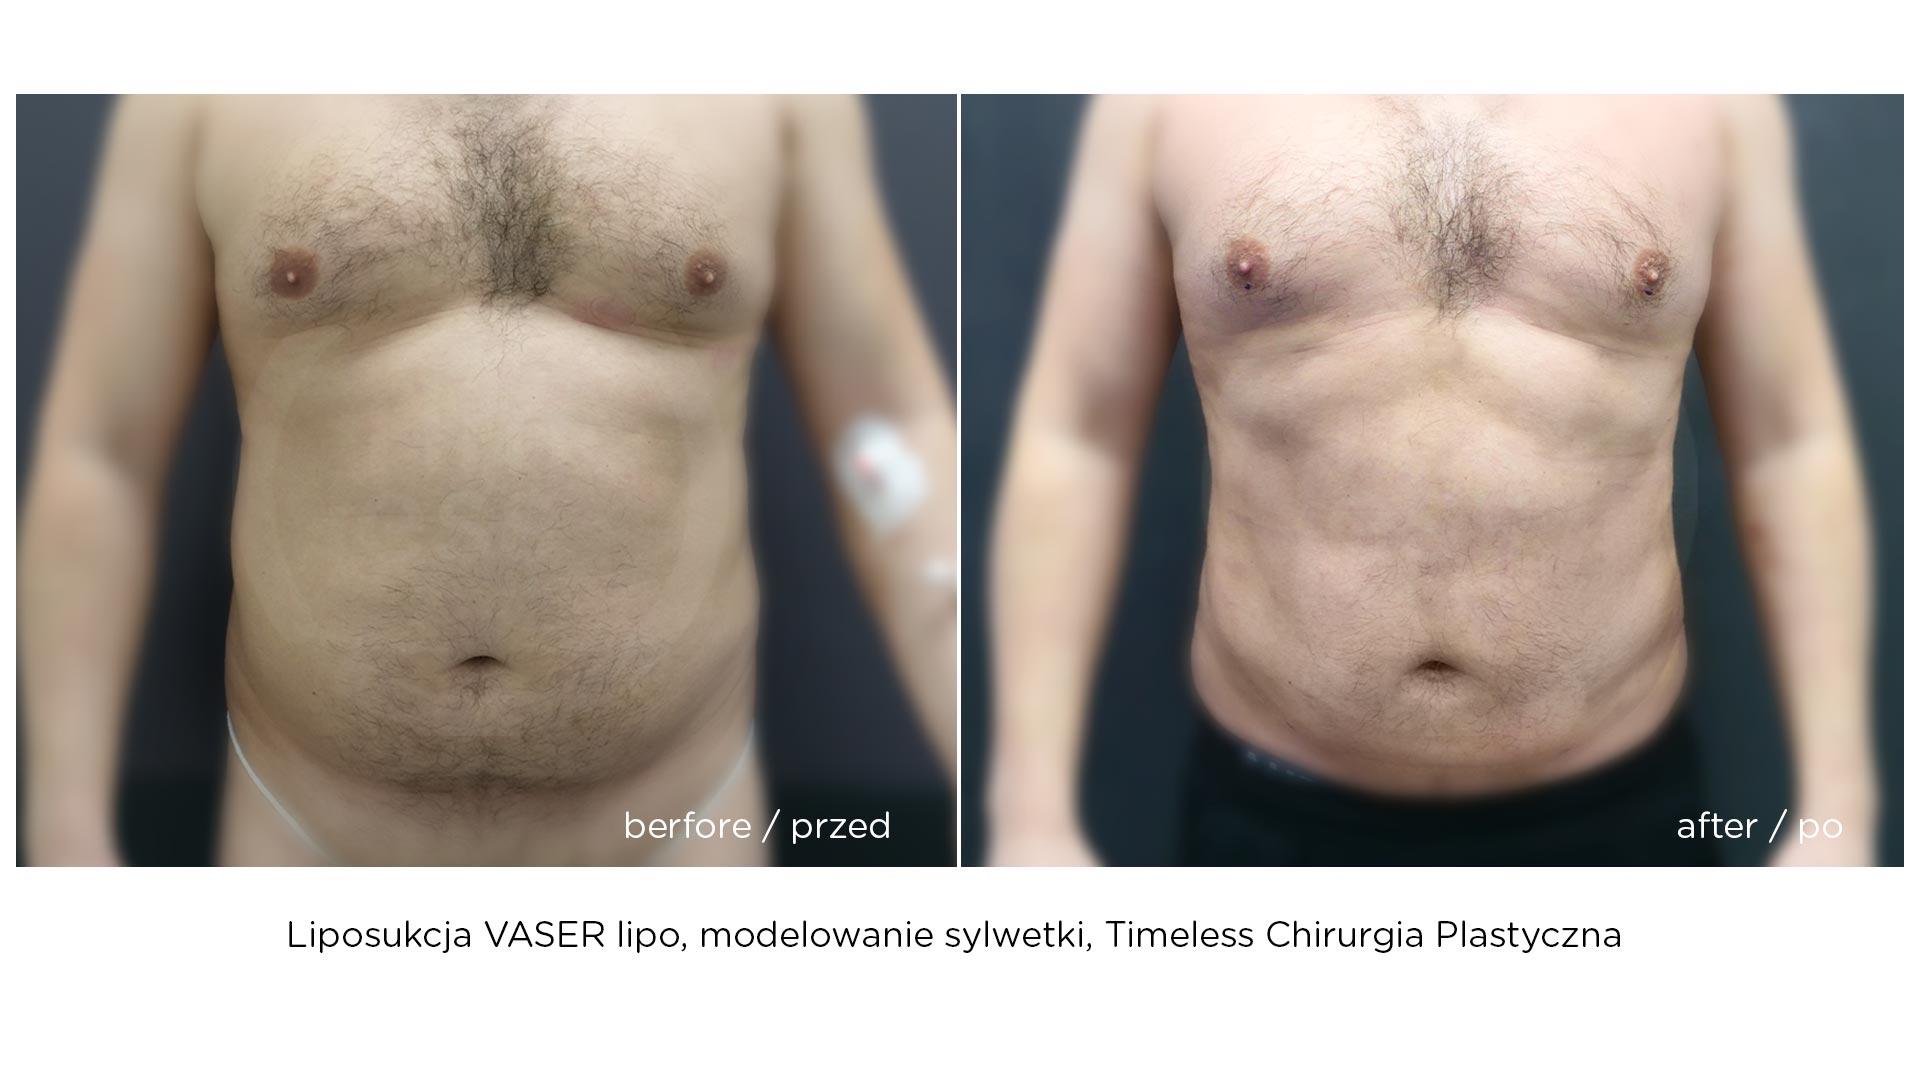 liposukcja-vaser-hd-2020-b1